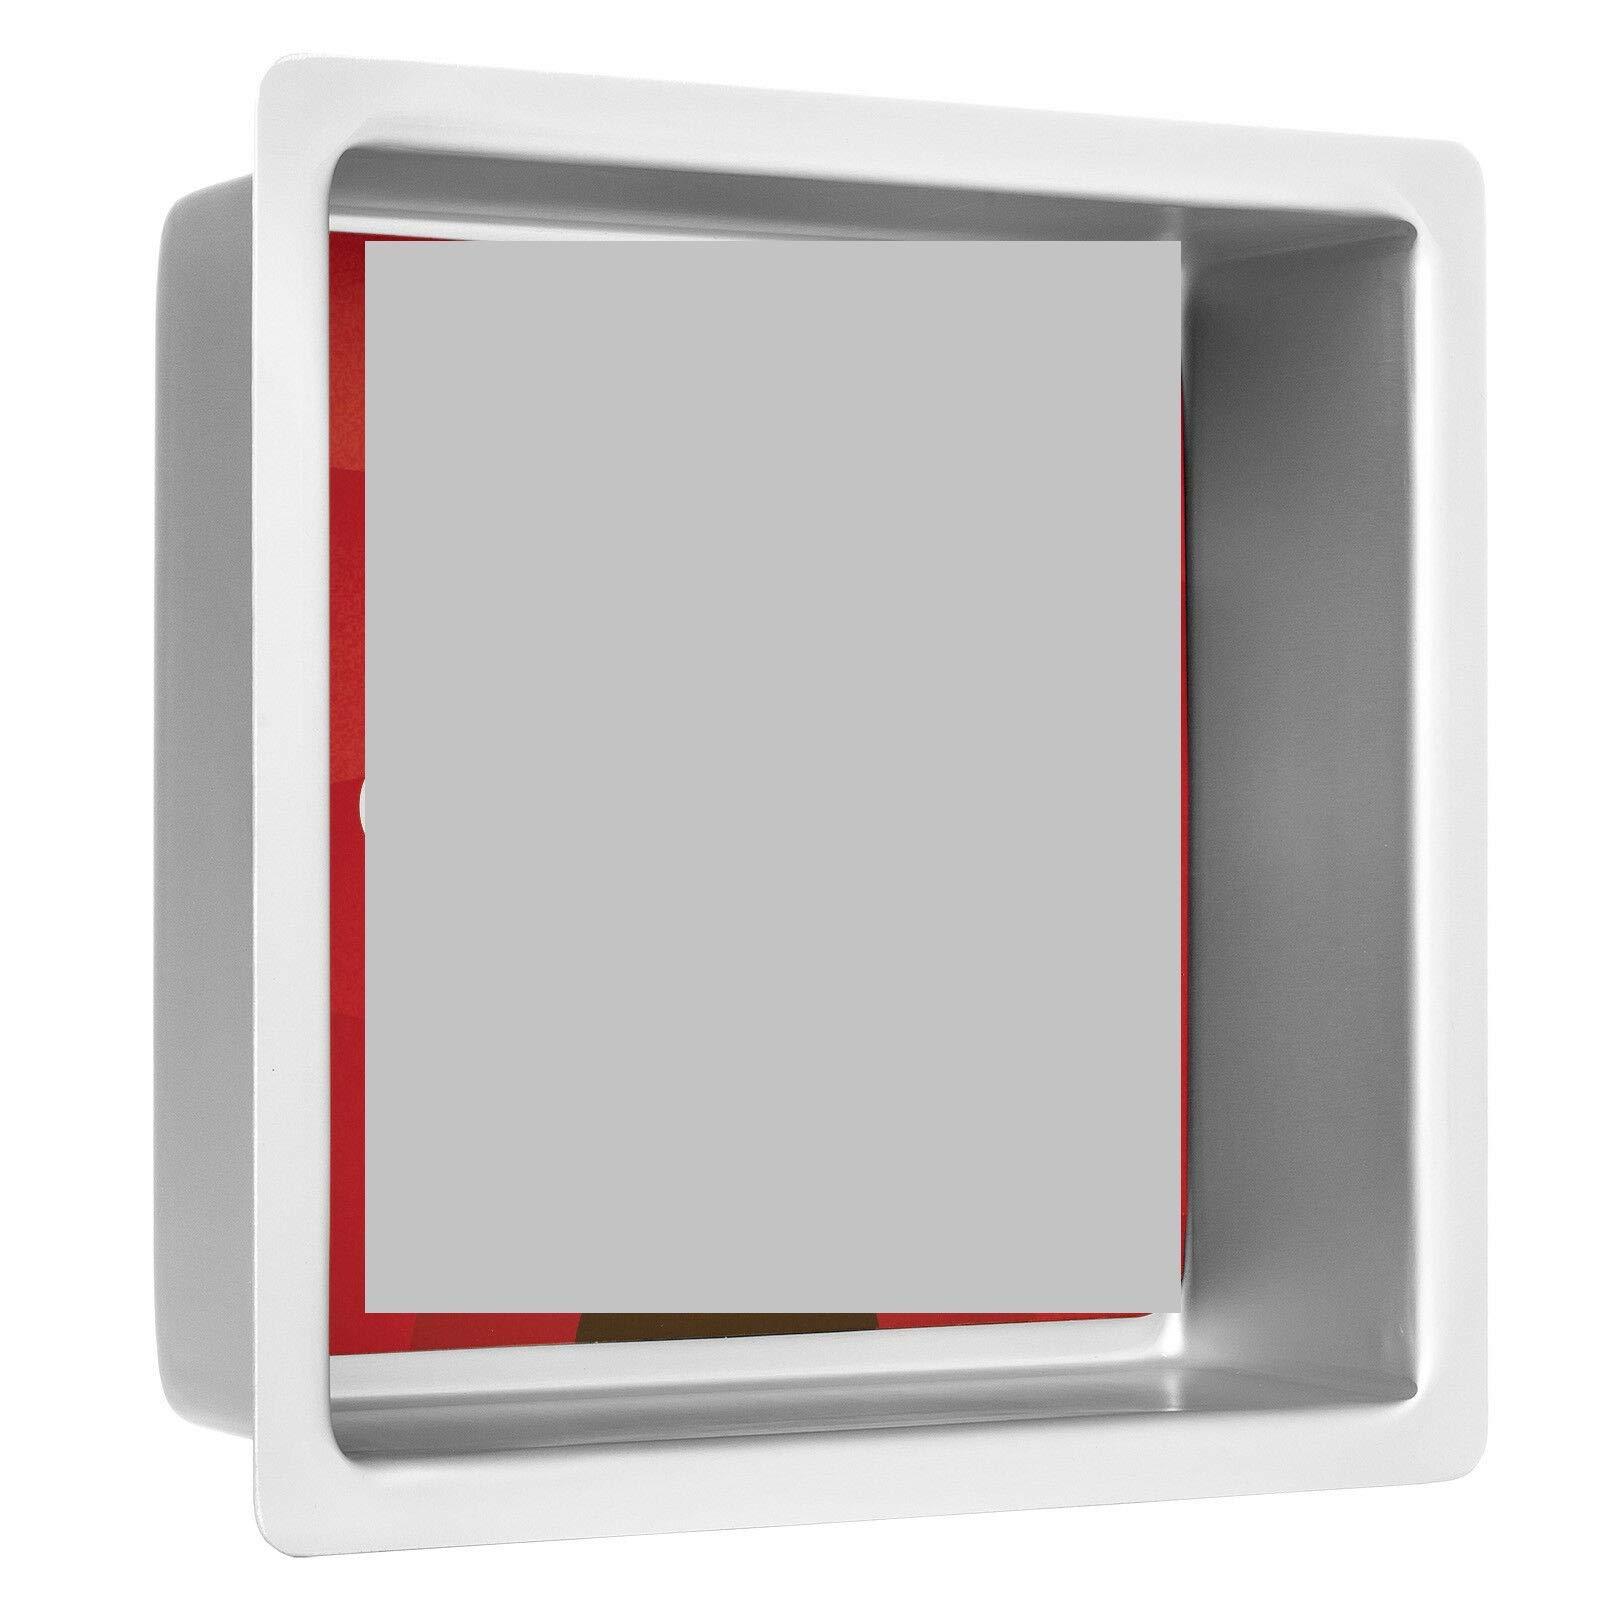 1 Pcs Professional Rectangular Aluminum Sheet Cake Pan 8 x 8 x 3 Inch #MWMN